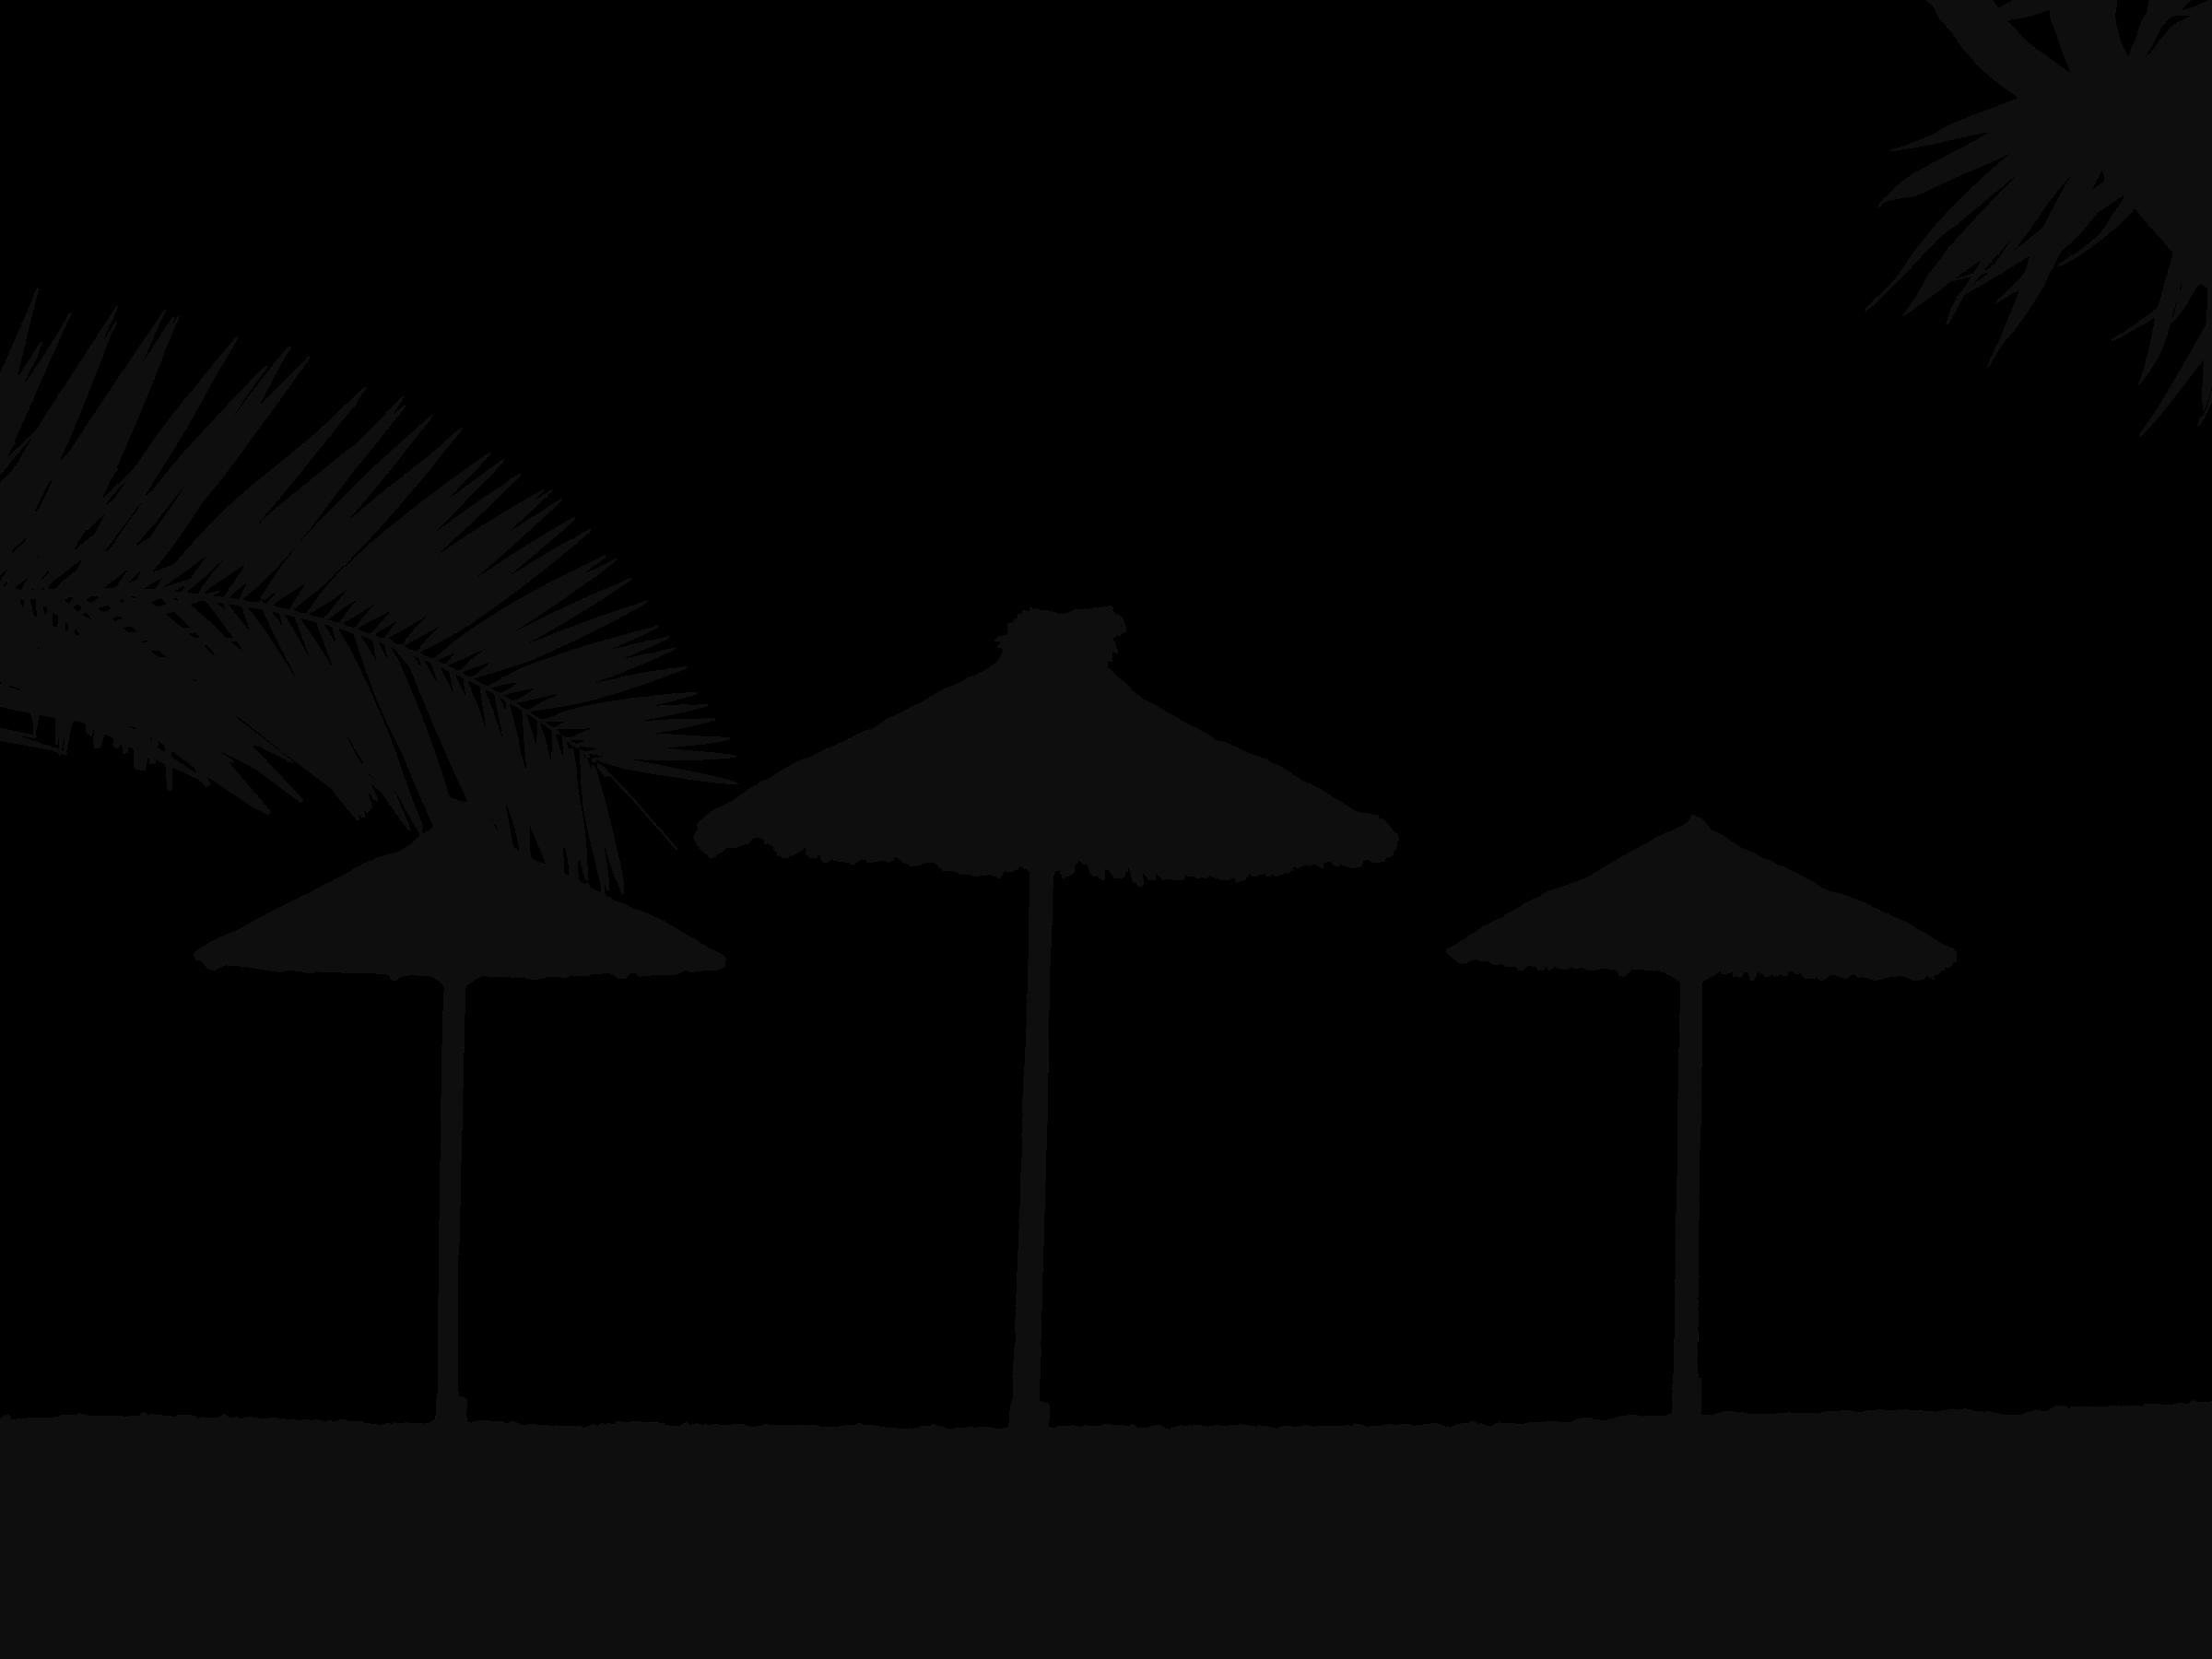 clipart transparent download Beach transparent tropical. Clipart silhouette big image